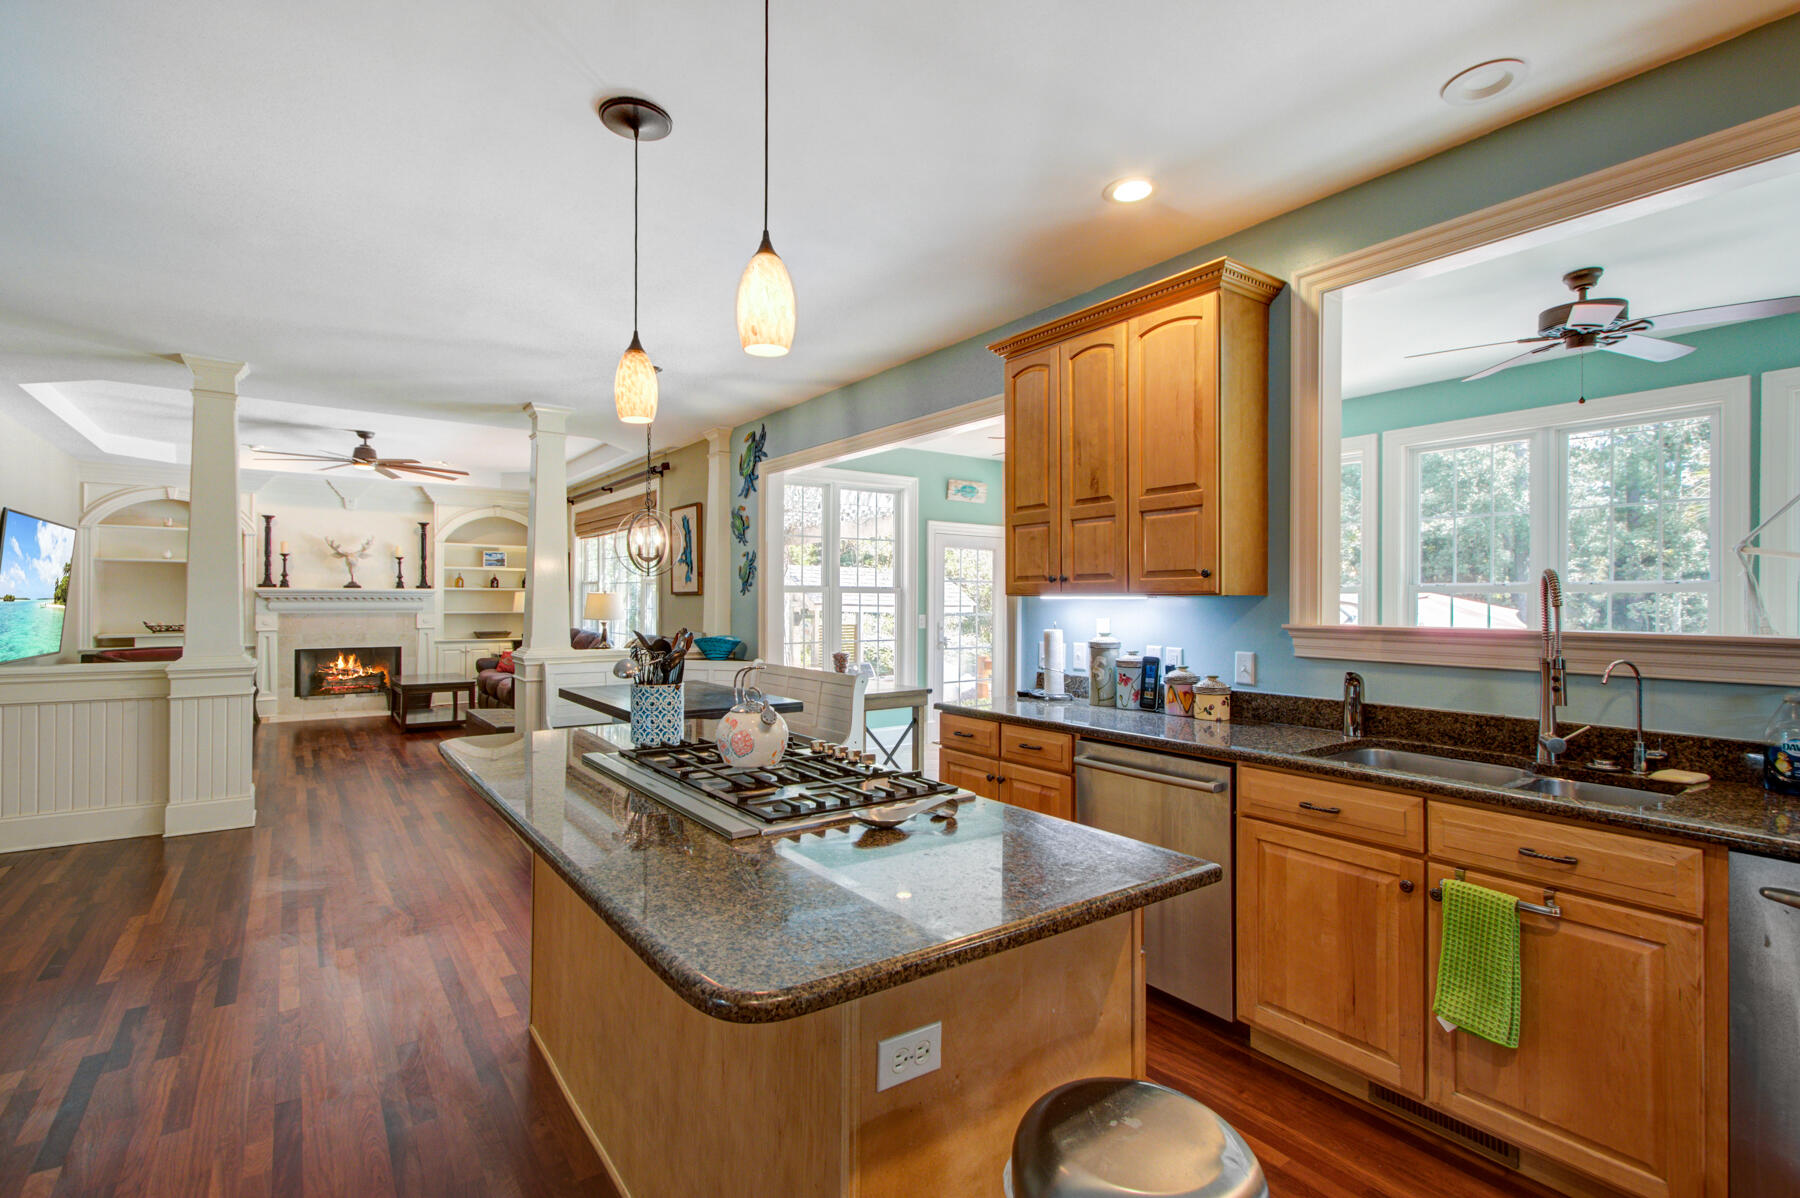 Dunes West Homes For Sale - 3095 Pignatelli, Mount Pleasant, SC - 9